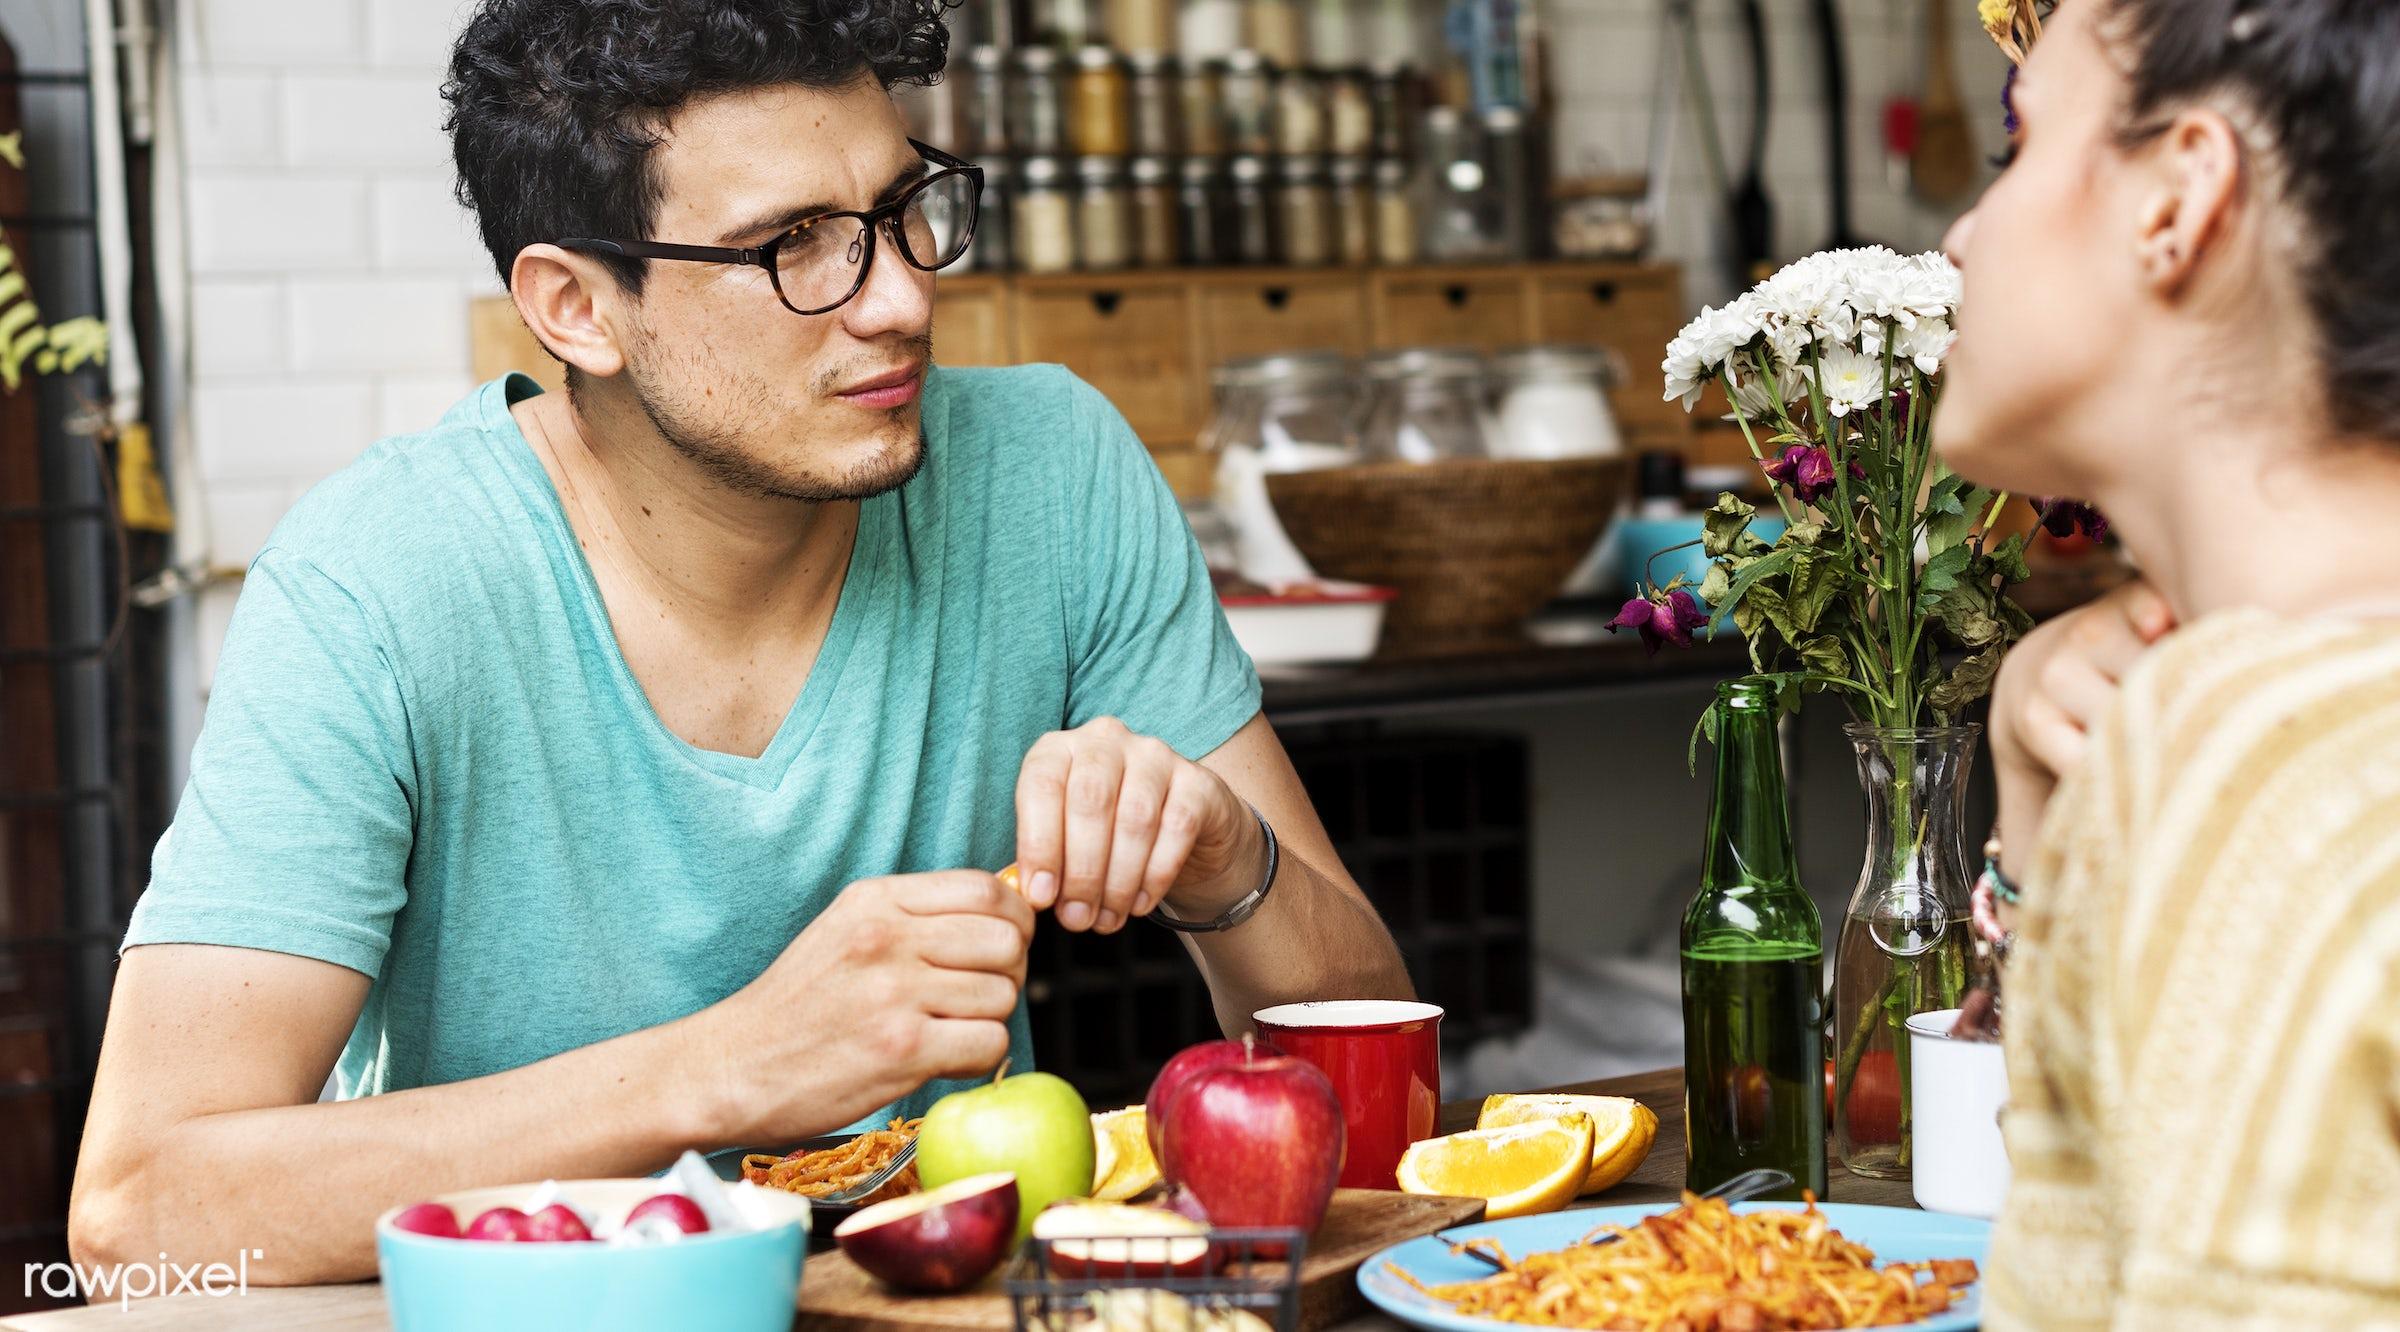 activity, apple, bonding, boyfriend, breakfast, casual, cheerful, couple, cuisine, culinary, dietary, dining, dinner, eating...